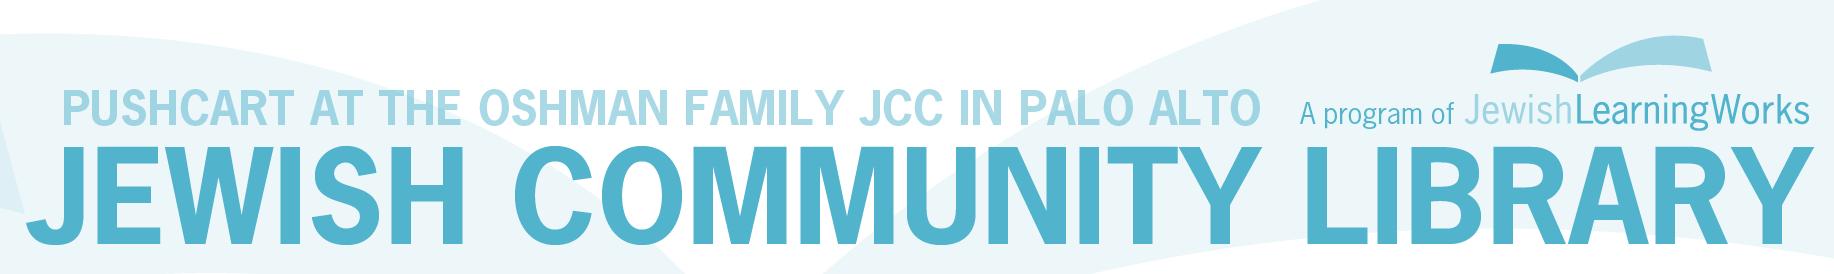 JCCPA_pushcart